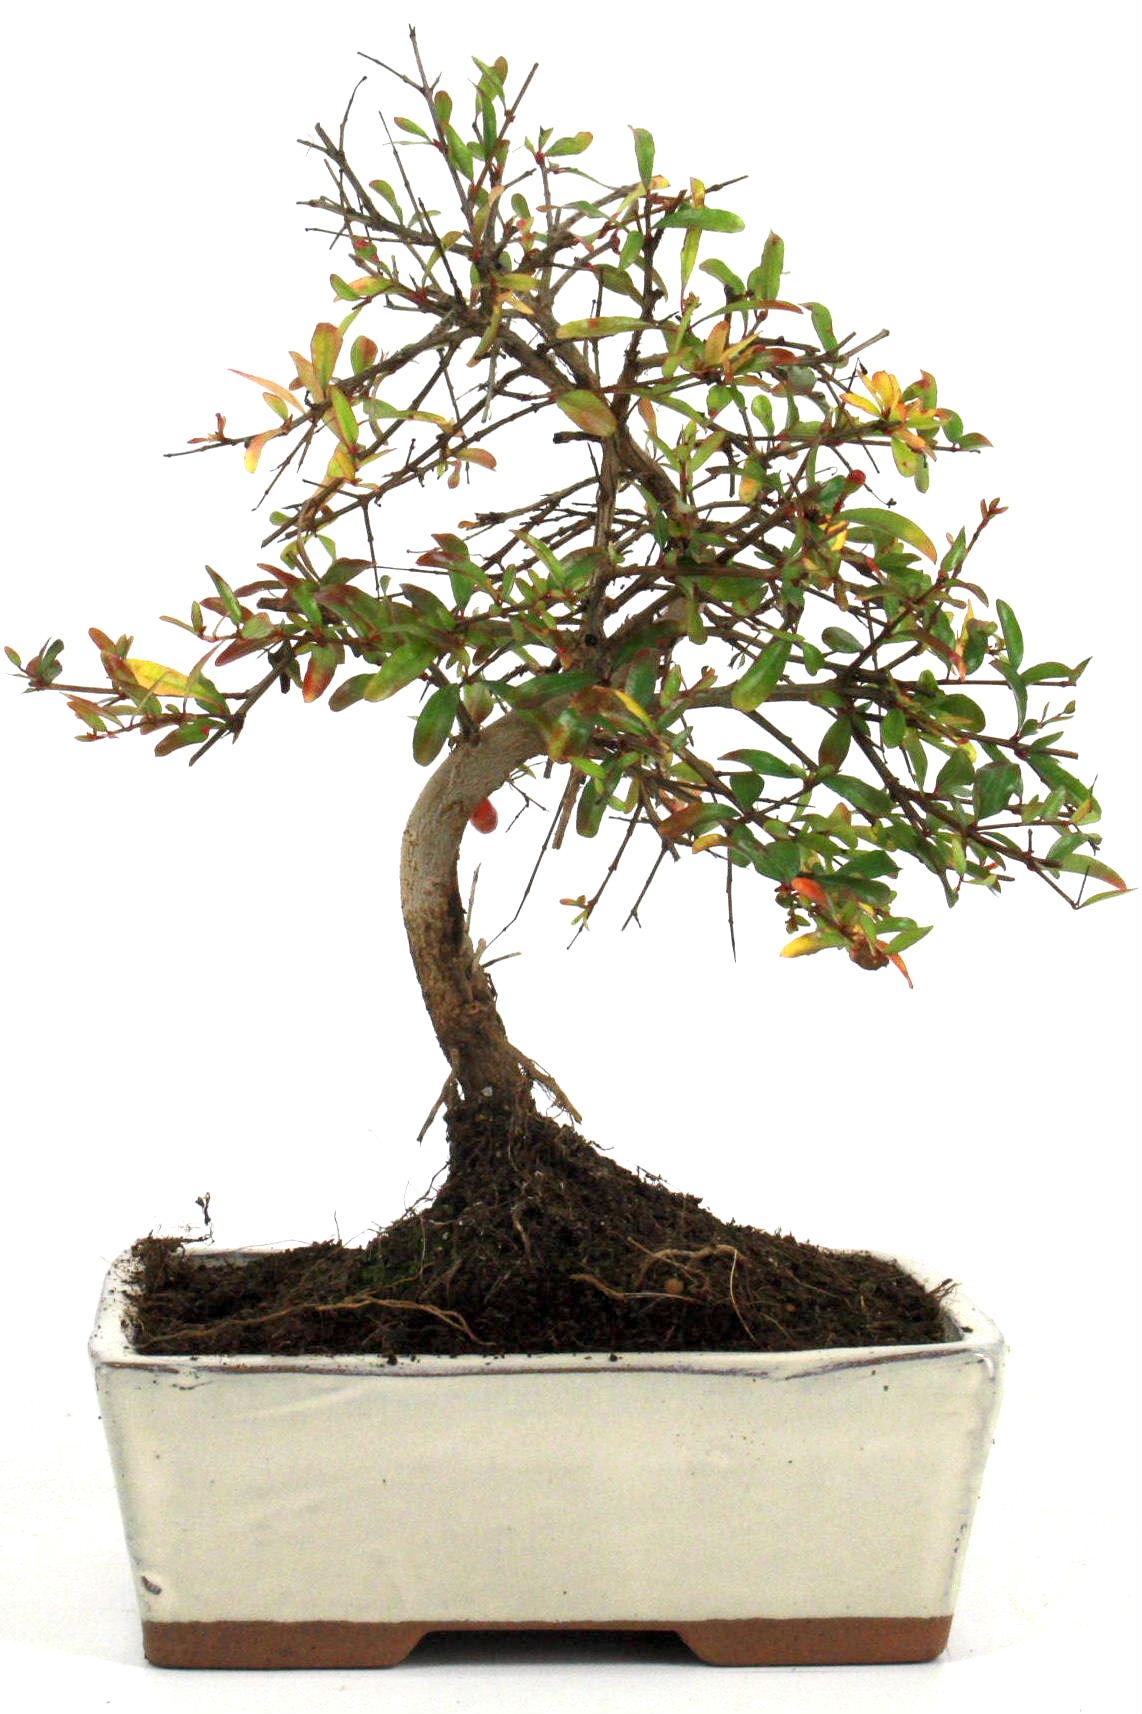 granatapfel bonsai 25 30 cm 1620 bei oyaki bonsai kaufen. Black Bedroom Furniture Sets. Home Design Ideas